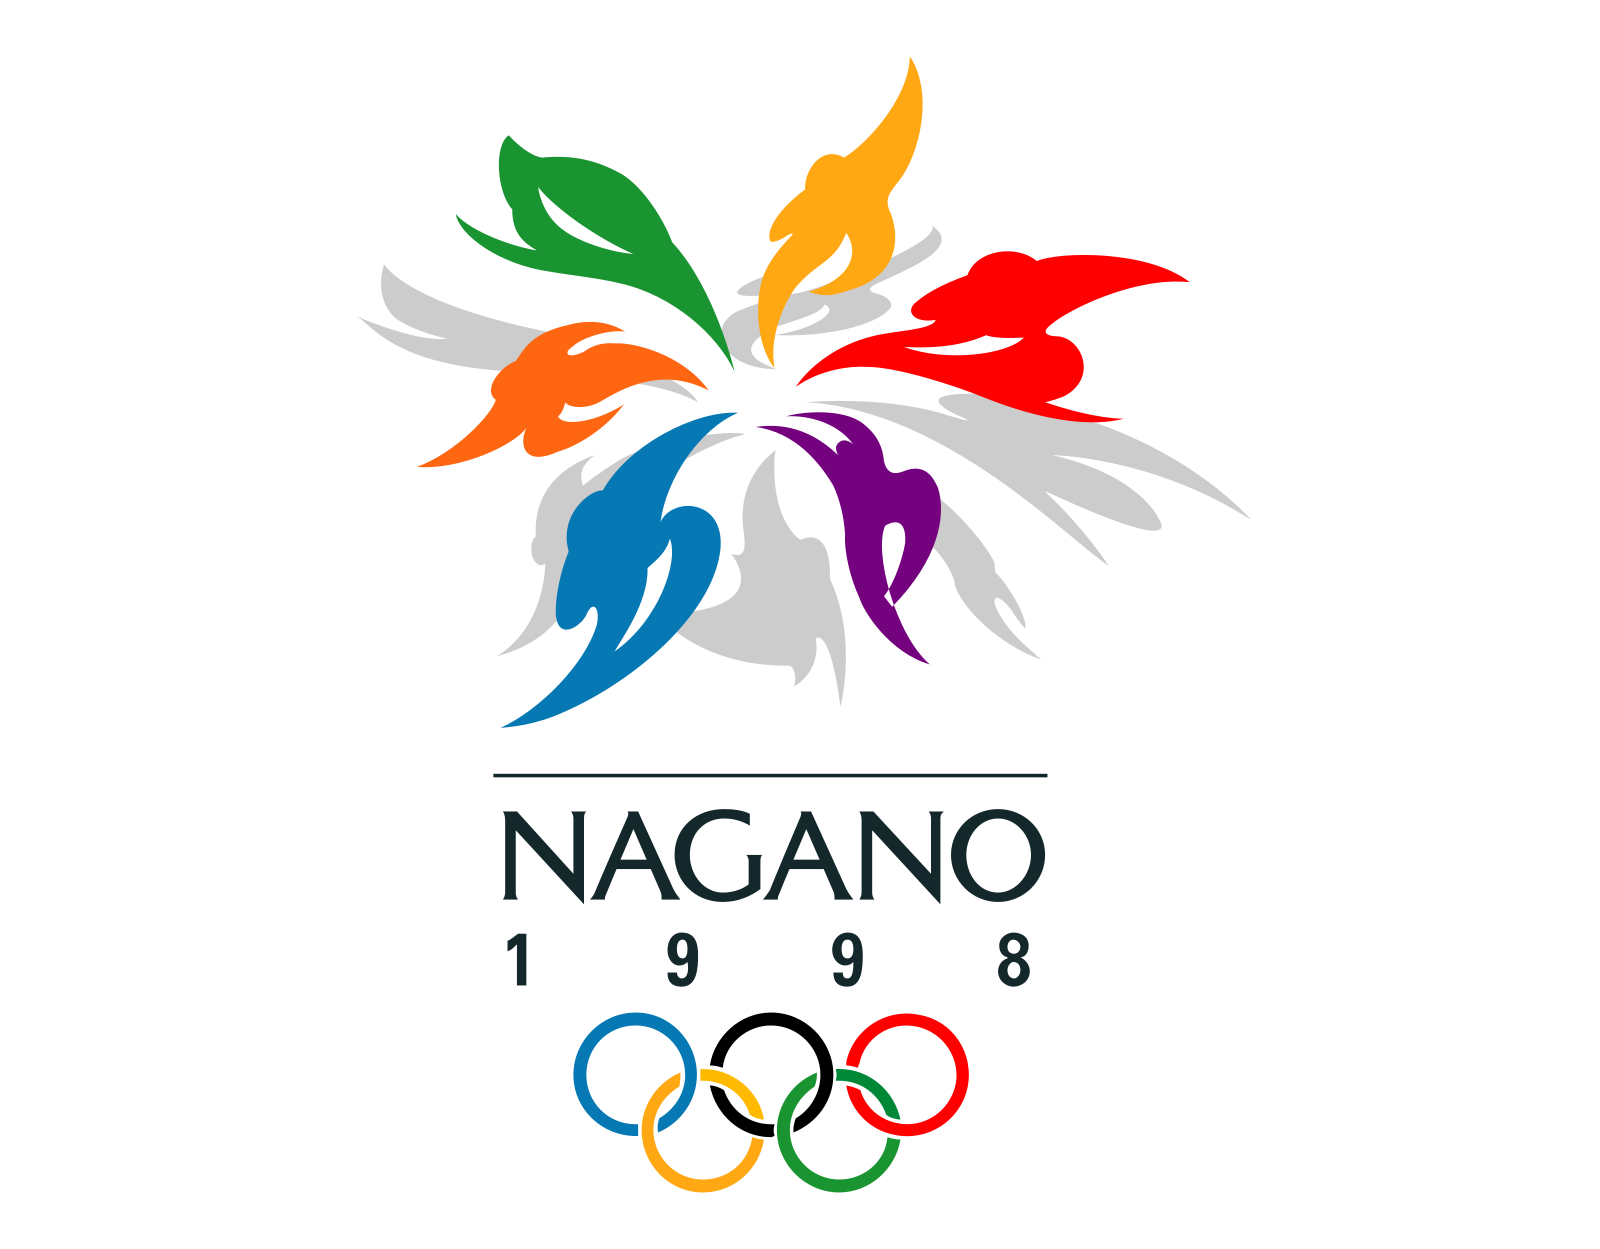 43 logos des jeux olympiques de 1924 2020 olympic logo 43 logos des jeux olympiques de 1924 2020 winter gameswinter olympic buycottarizona